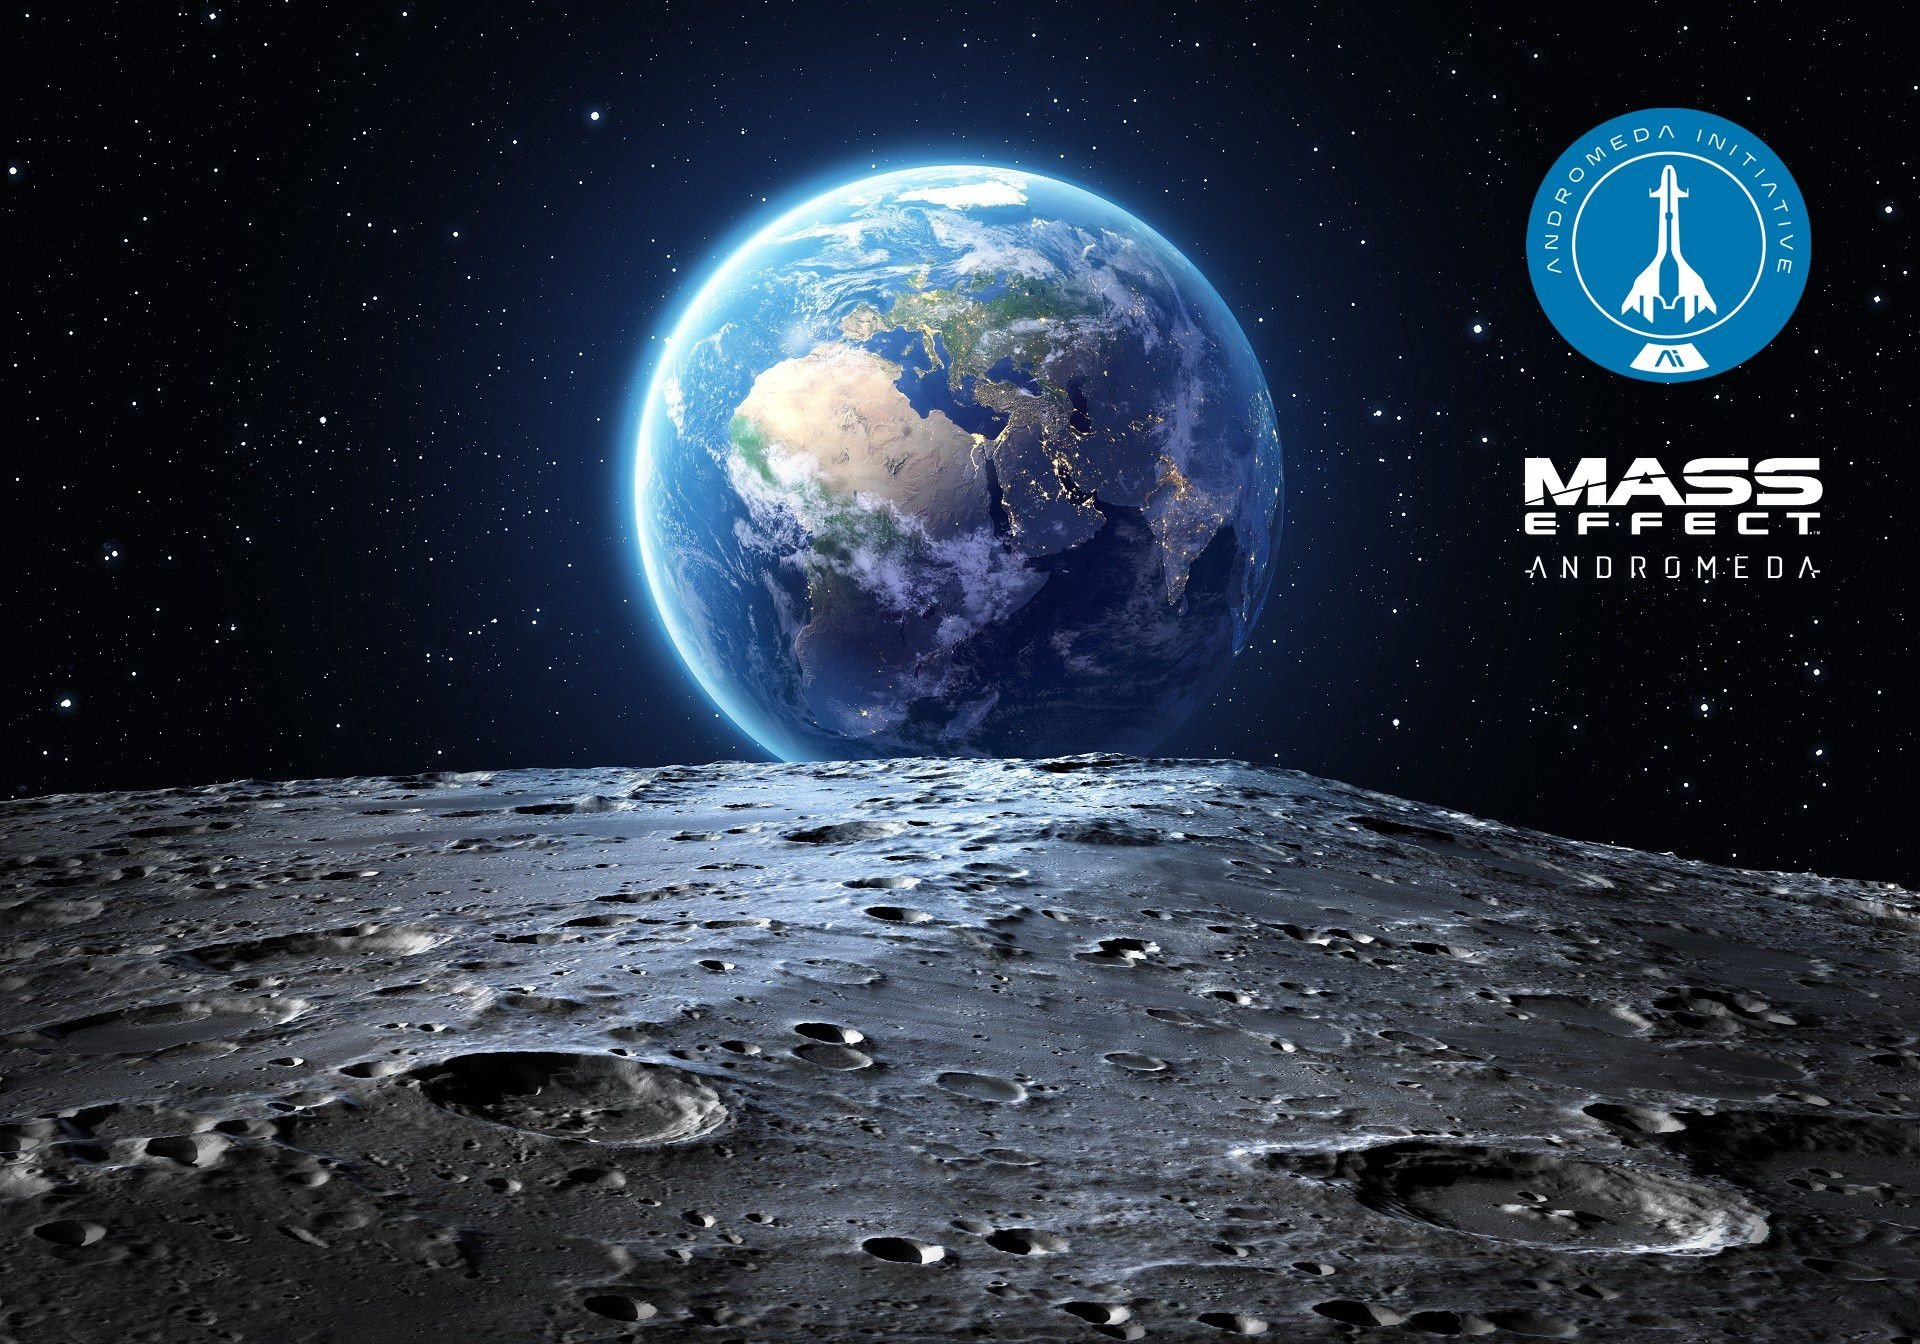 Mass Effect Andromeda Andromeda Initiative Mass Effect Hd